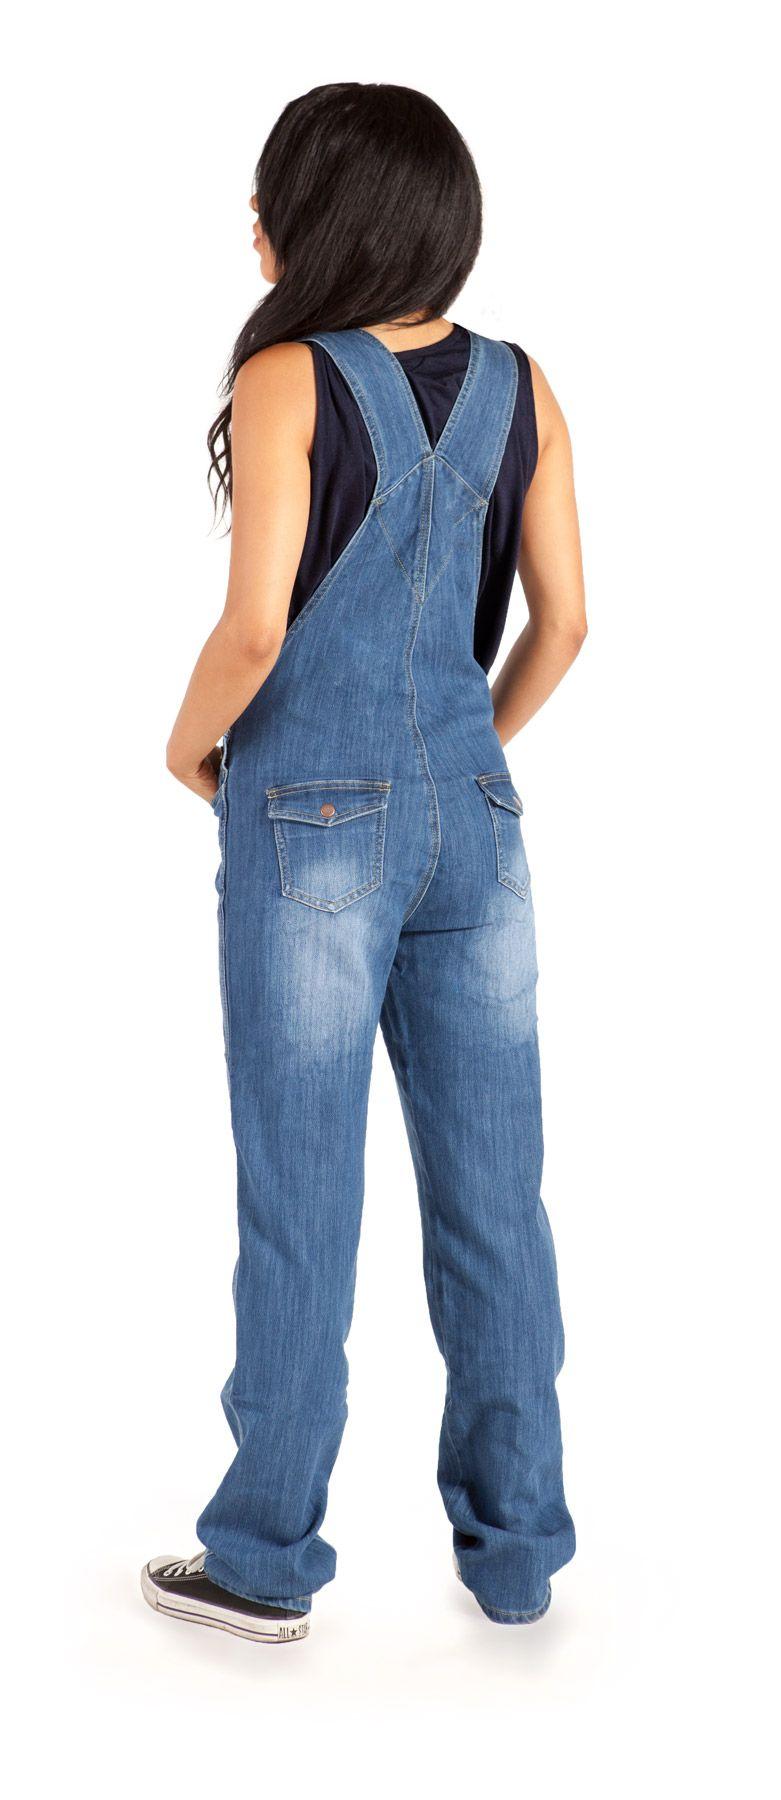 Women Denim Dungarees Slim Fit Ripped Jeans Ladies Jumpsuit Rompers UK Size 8-18